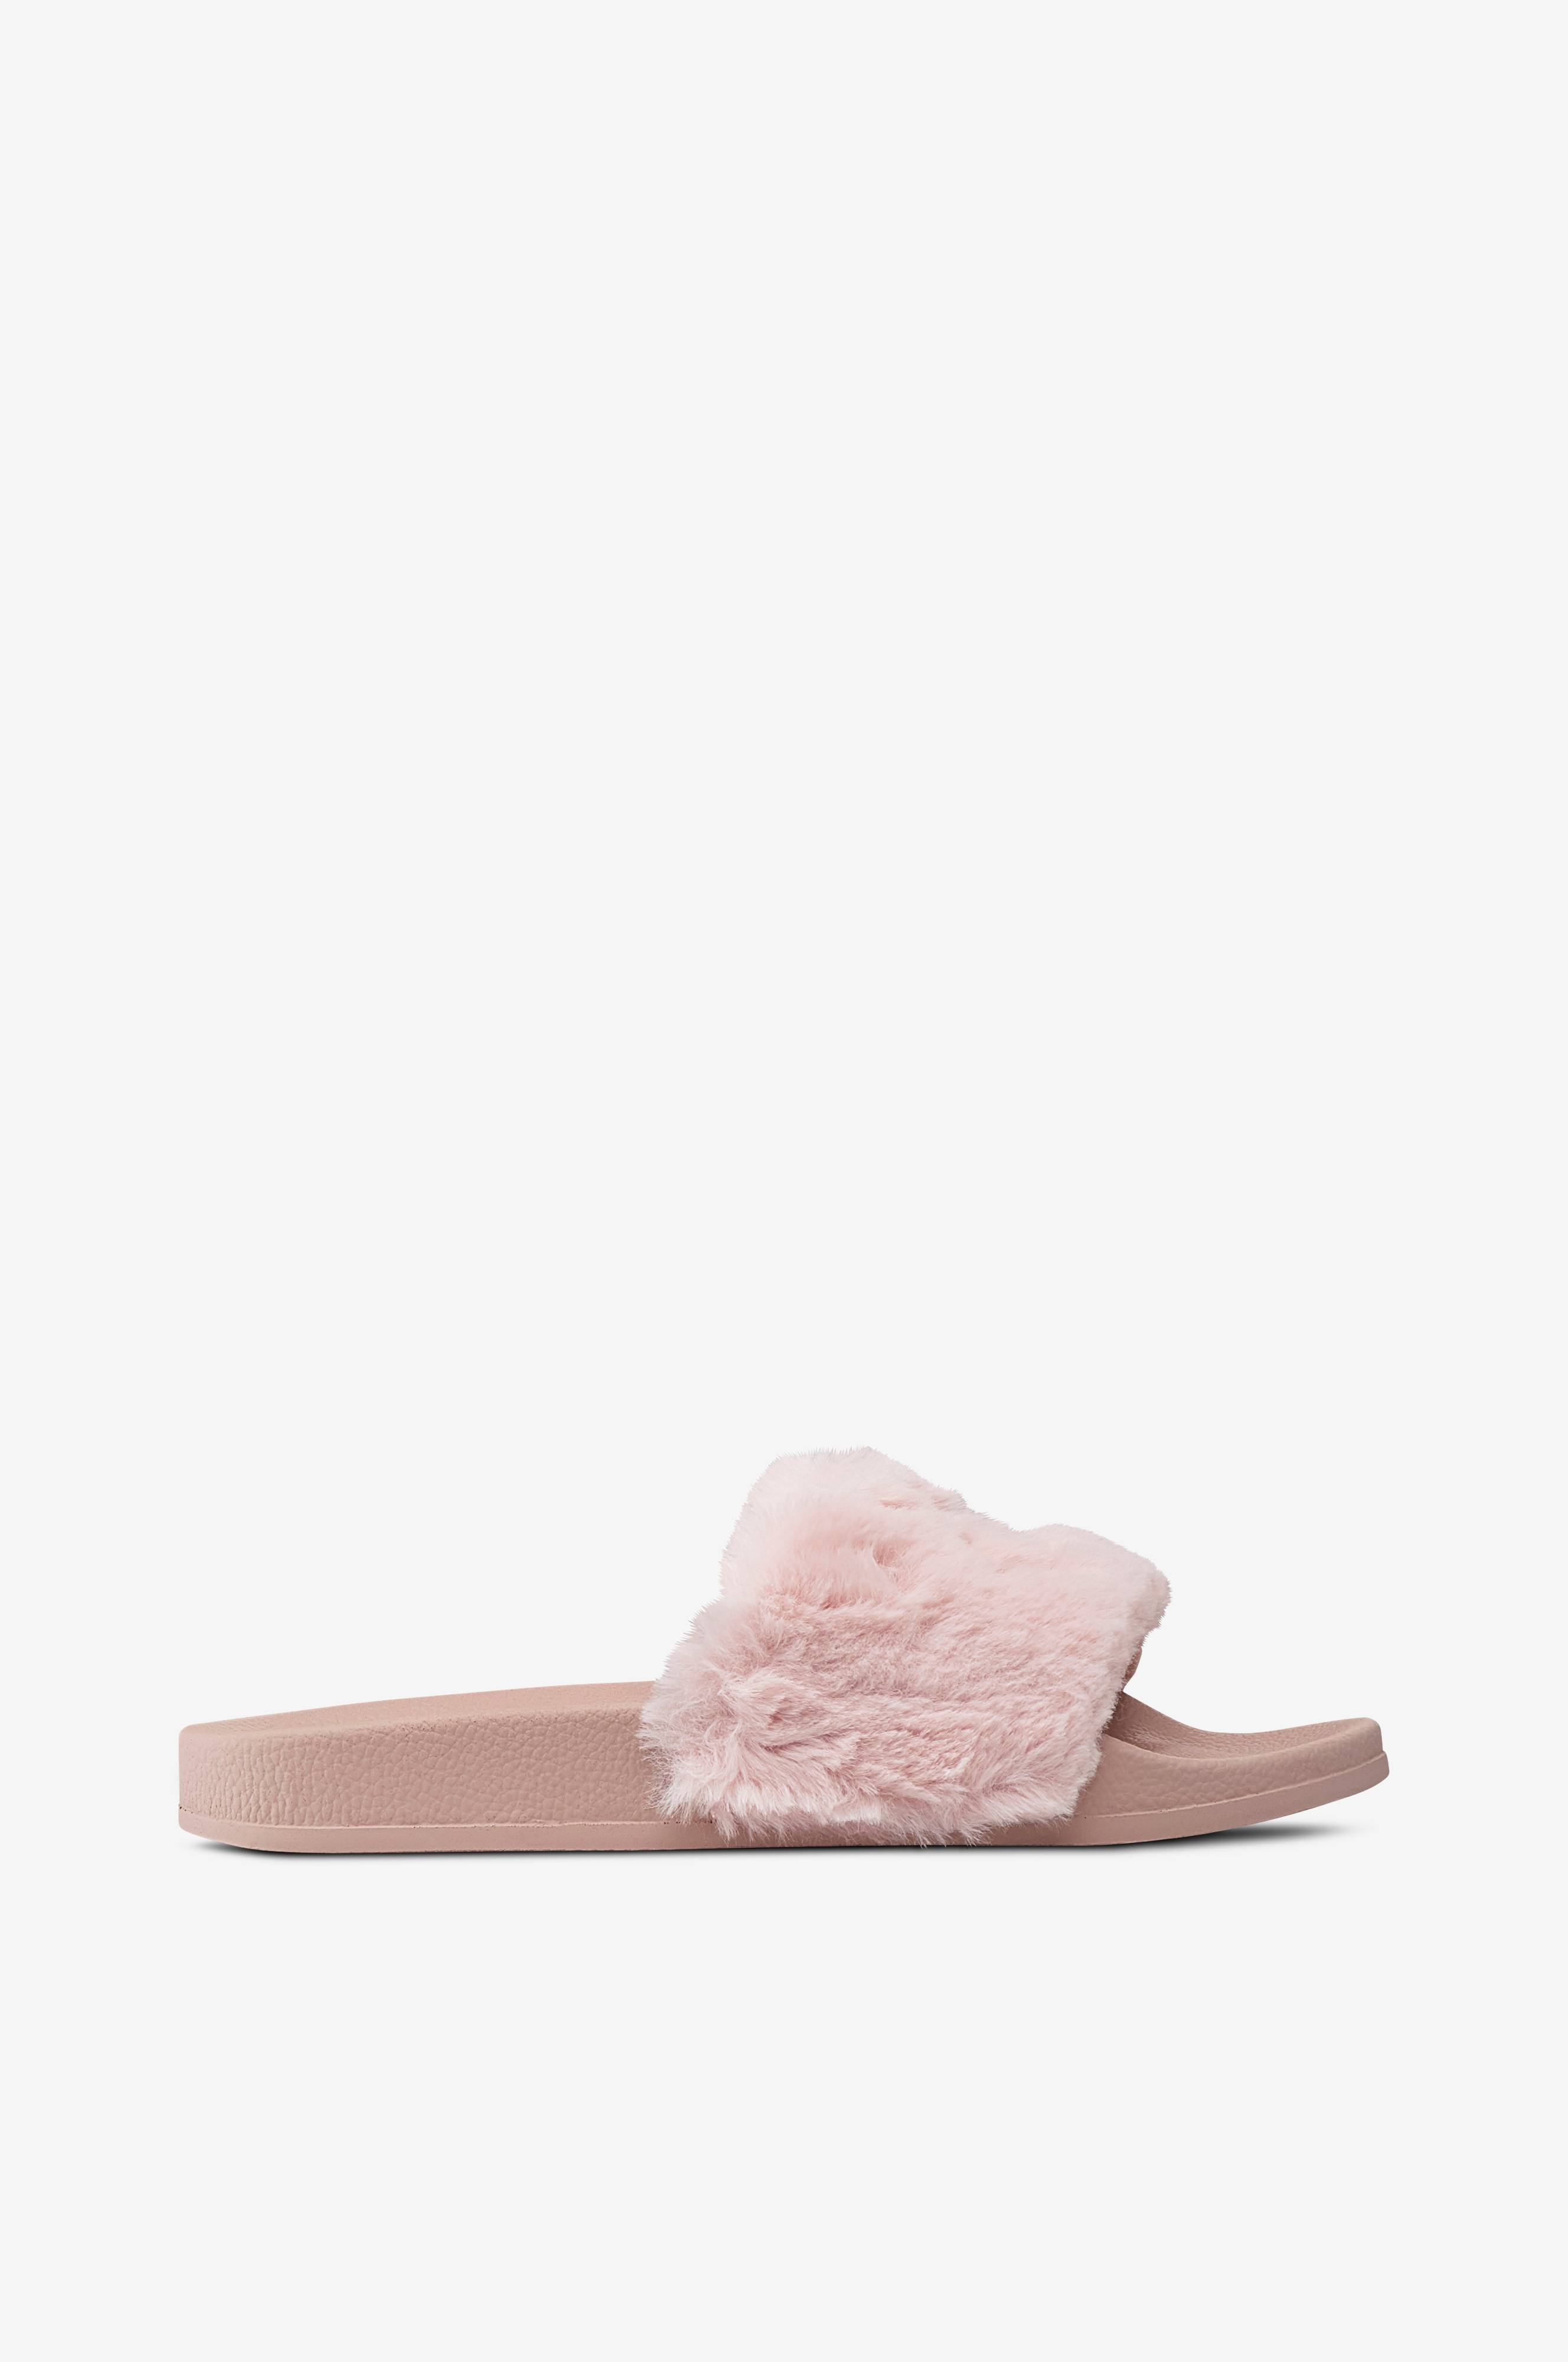 Svea Alex Fur sandaalit Musta Naiset Ellos.fi